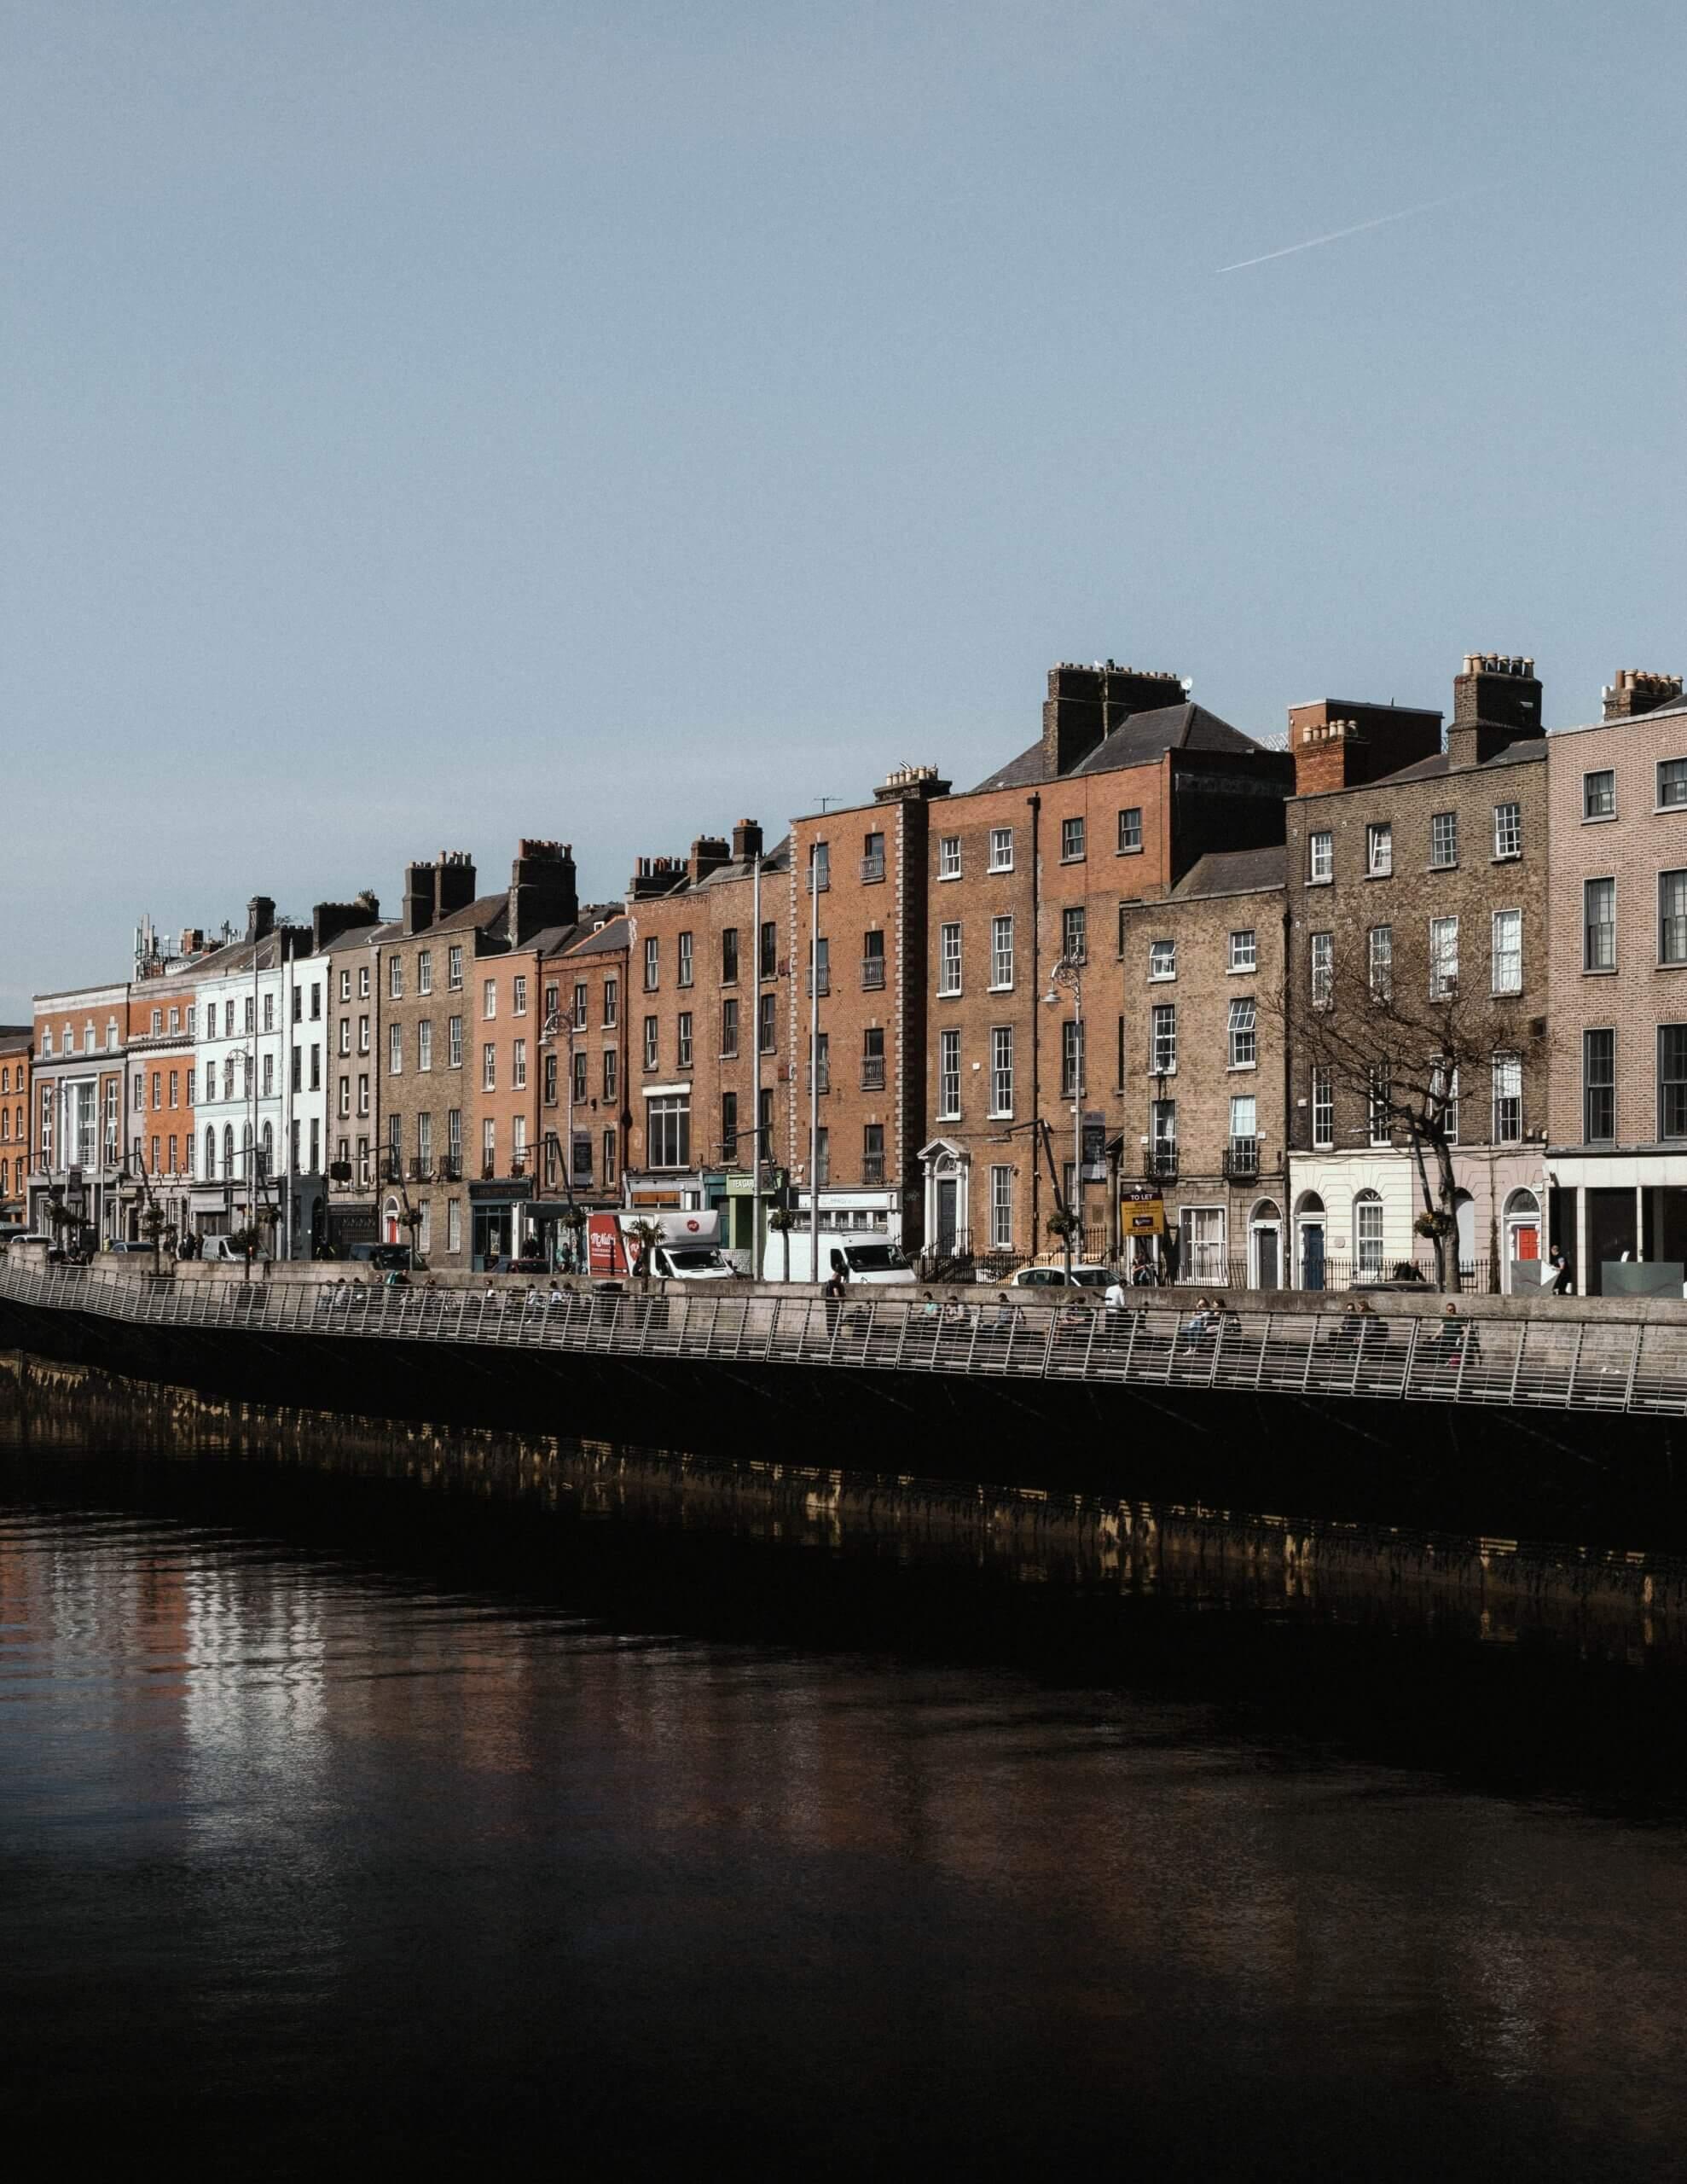 Dublin - Photo by Matteo Grando on Unsplash